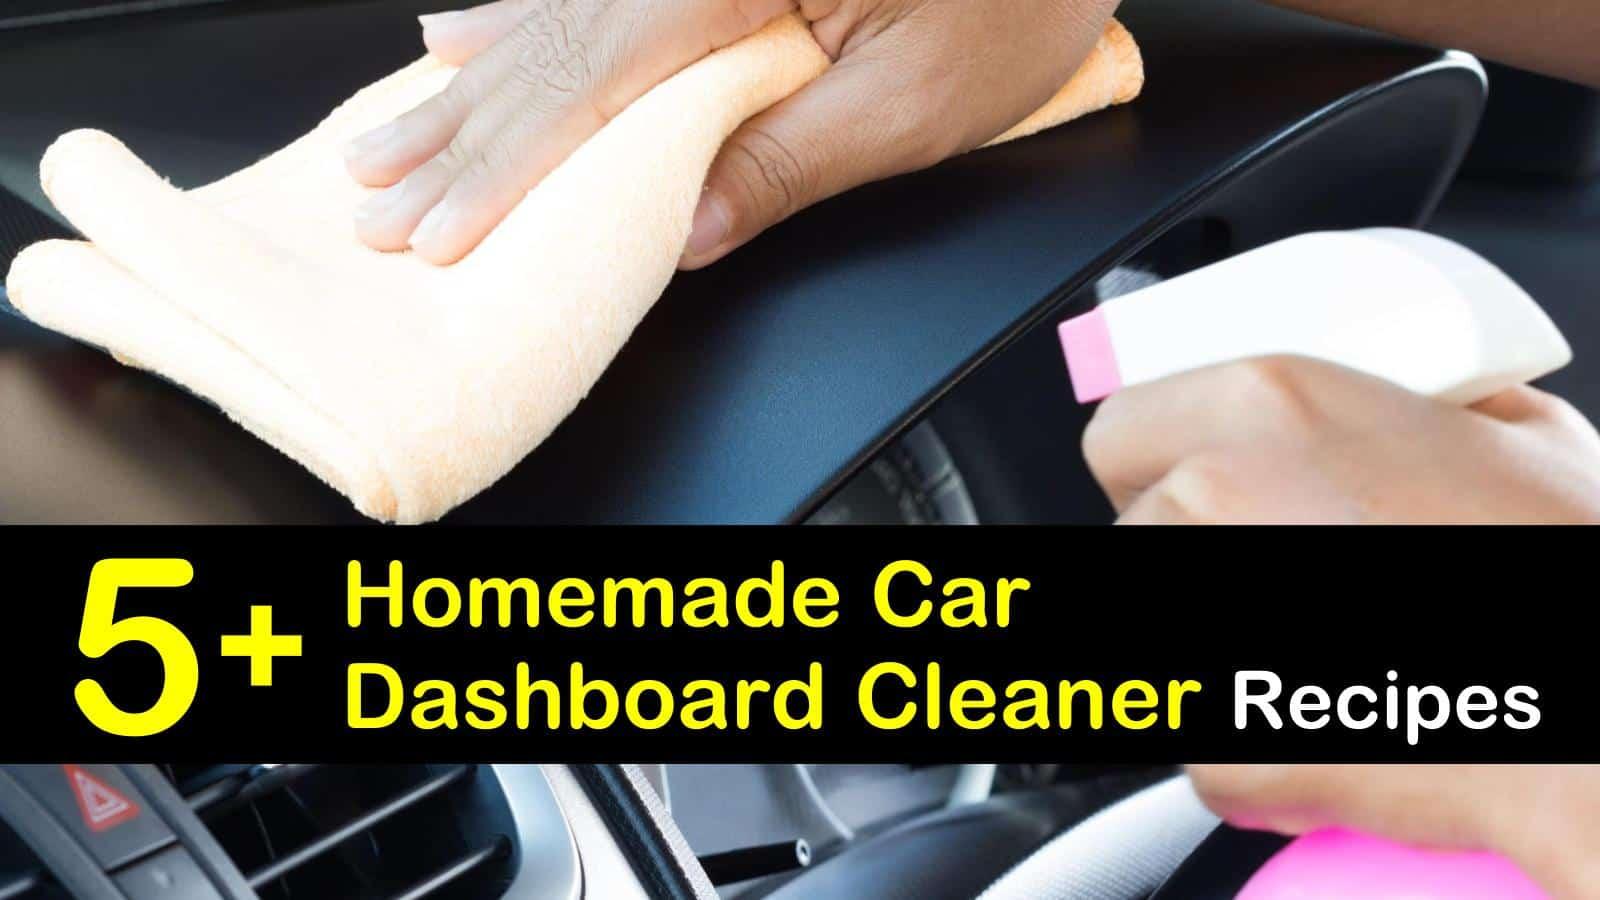 homemade car dashboard cleaner titleimg1